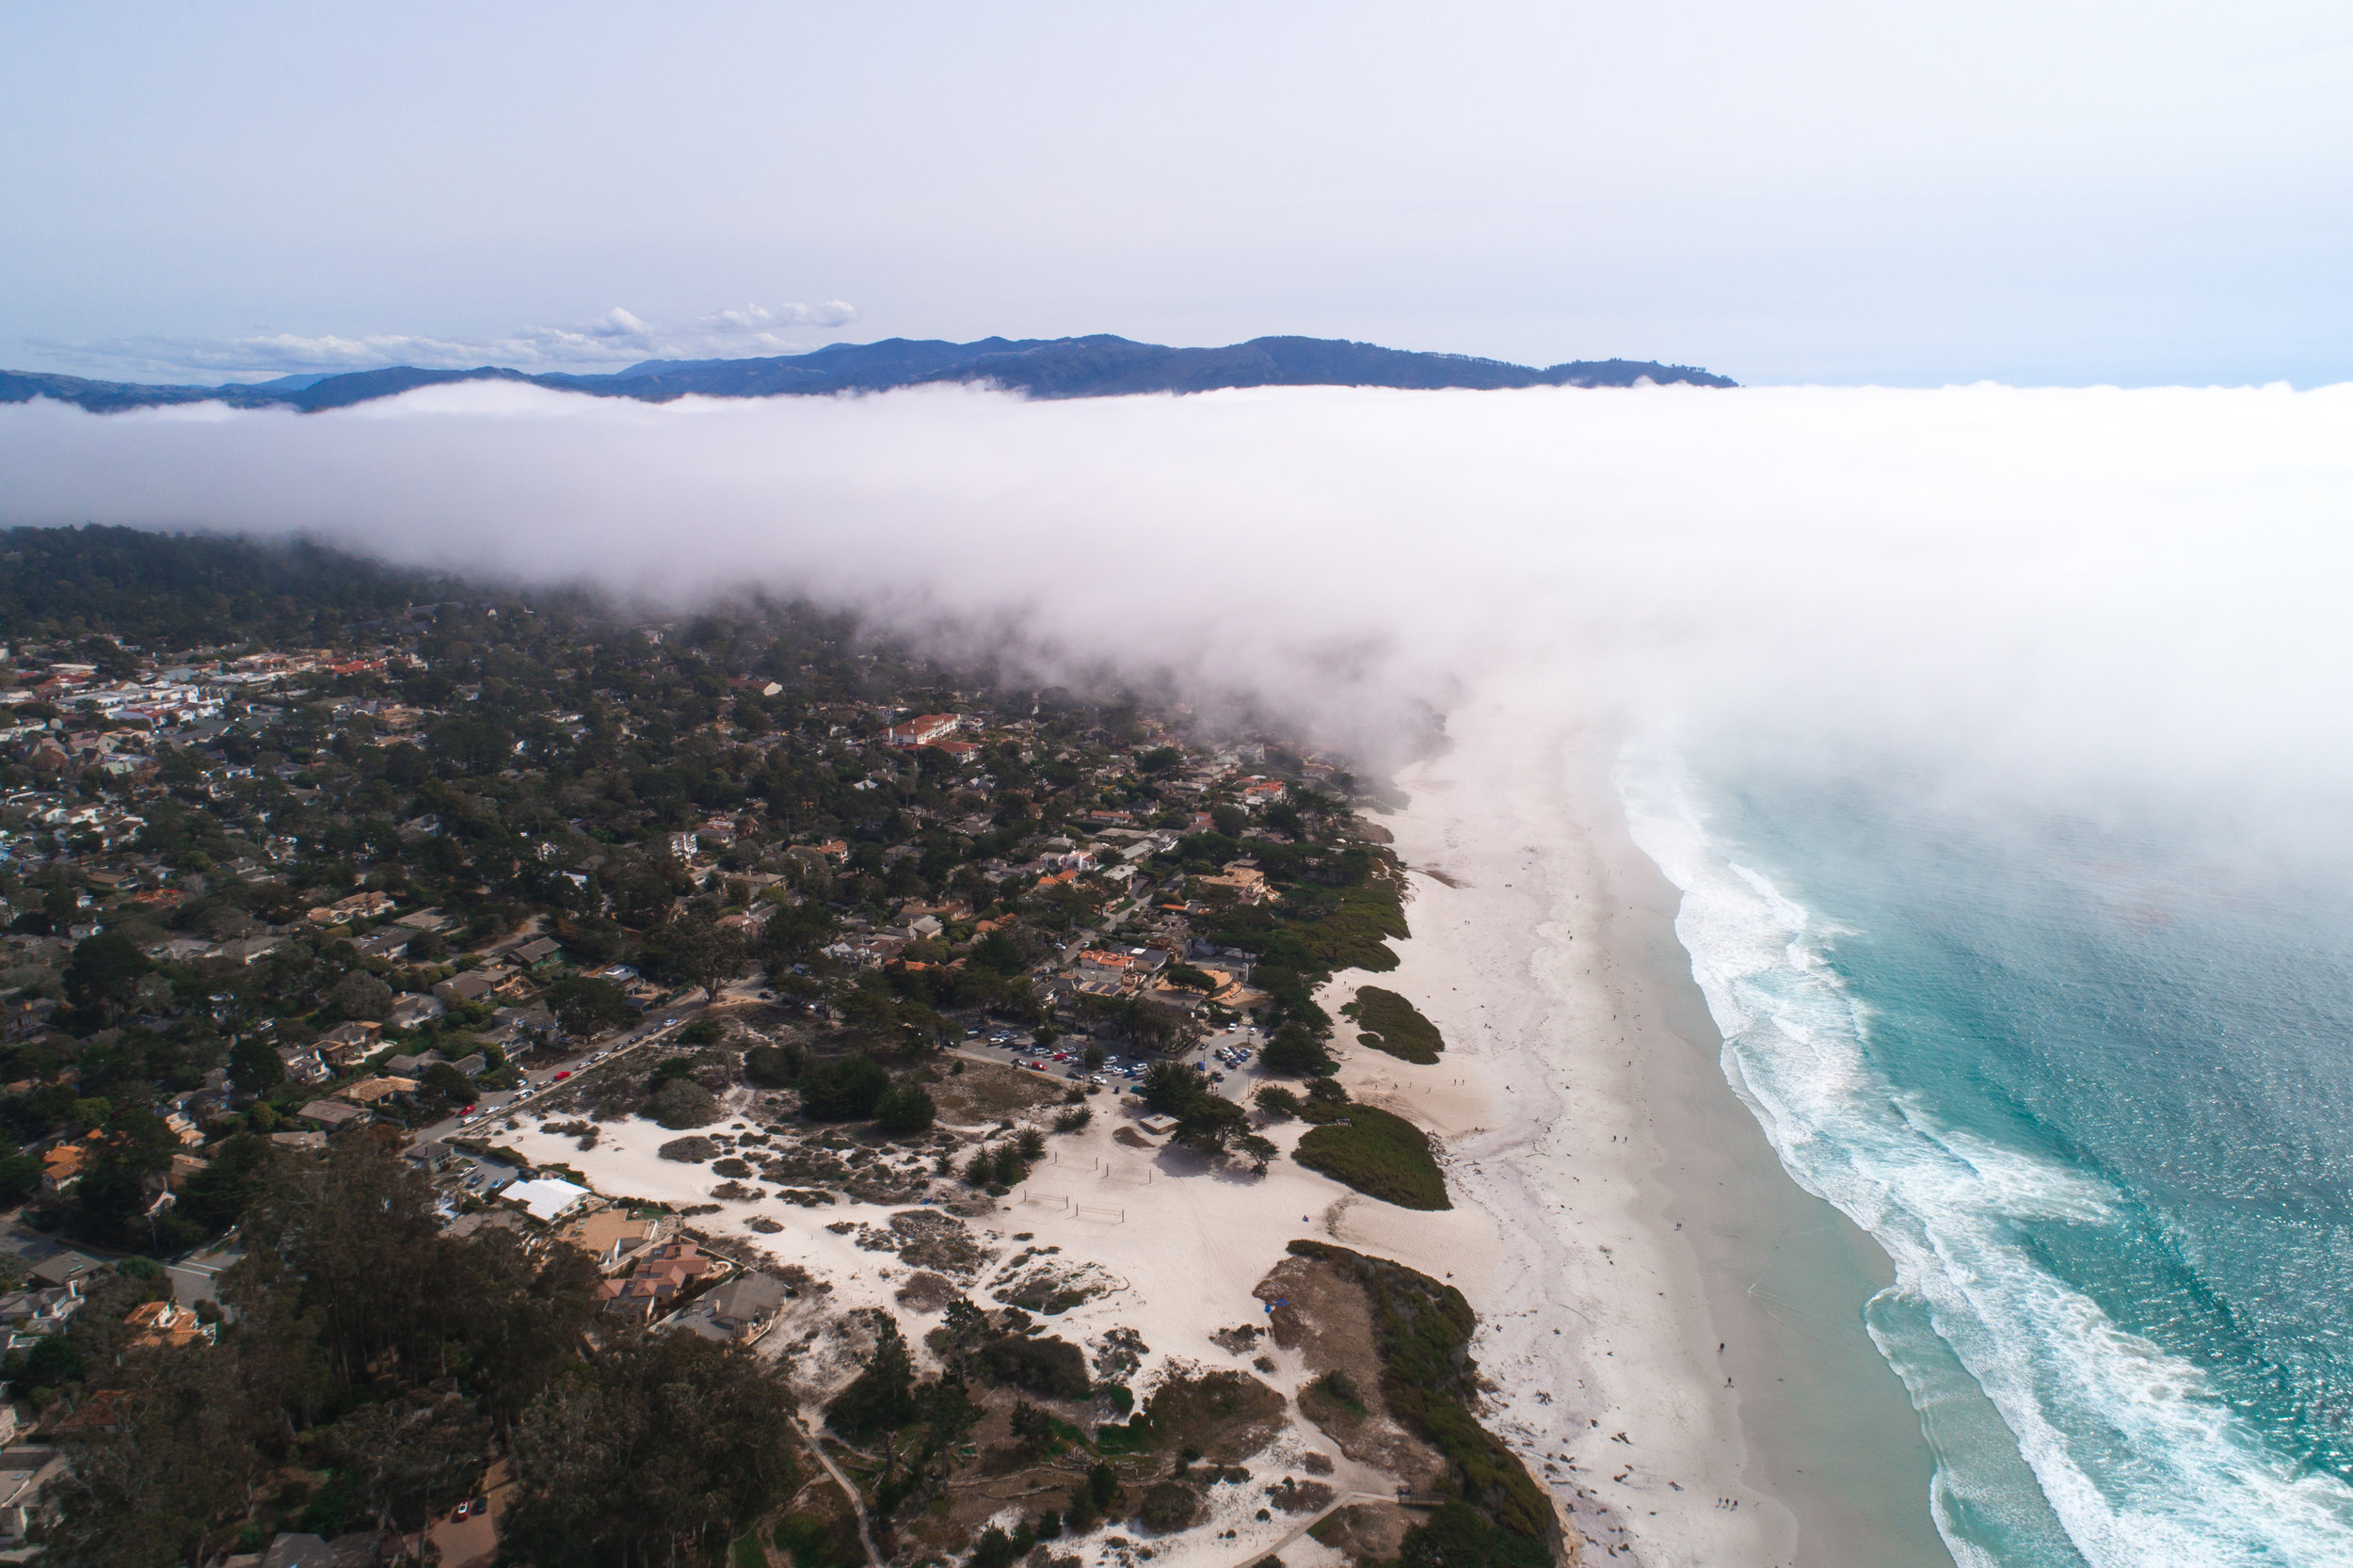 ABE1_Drone_Monterey_Carmel-12.jpg